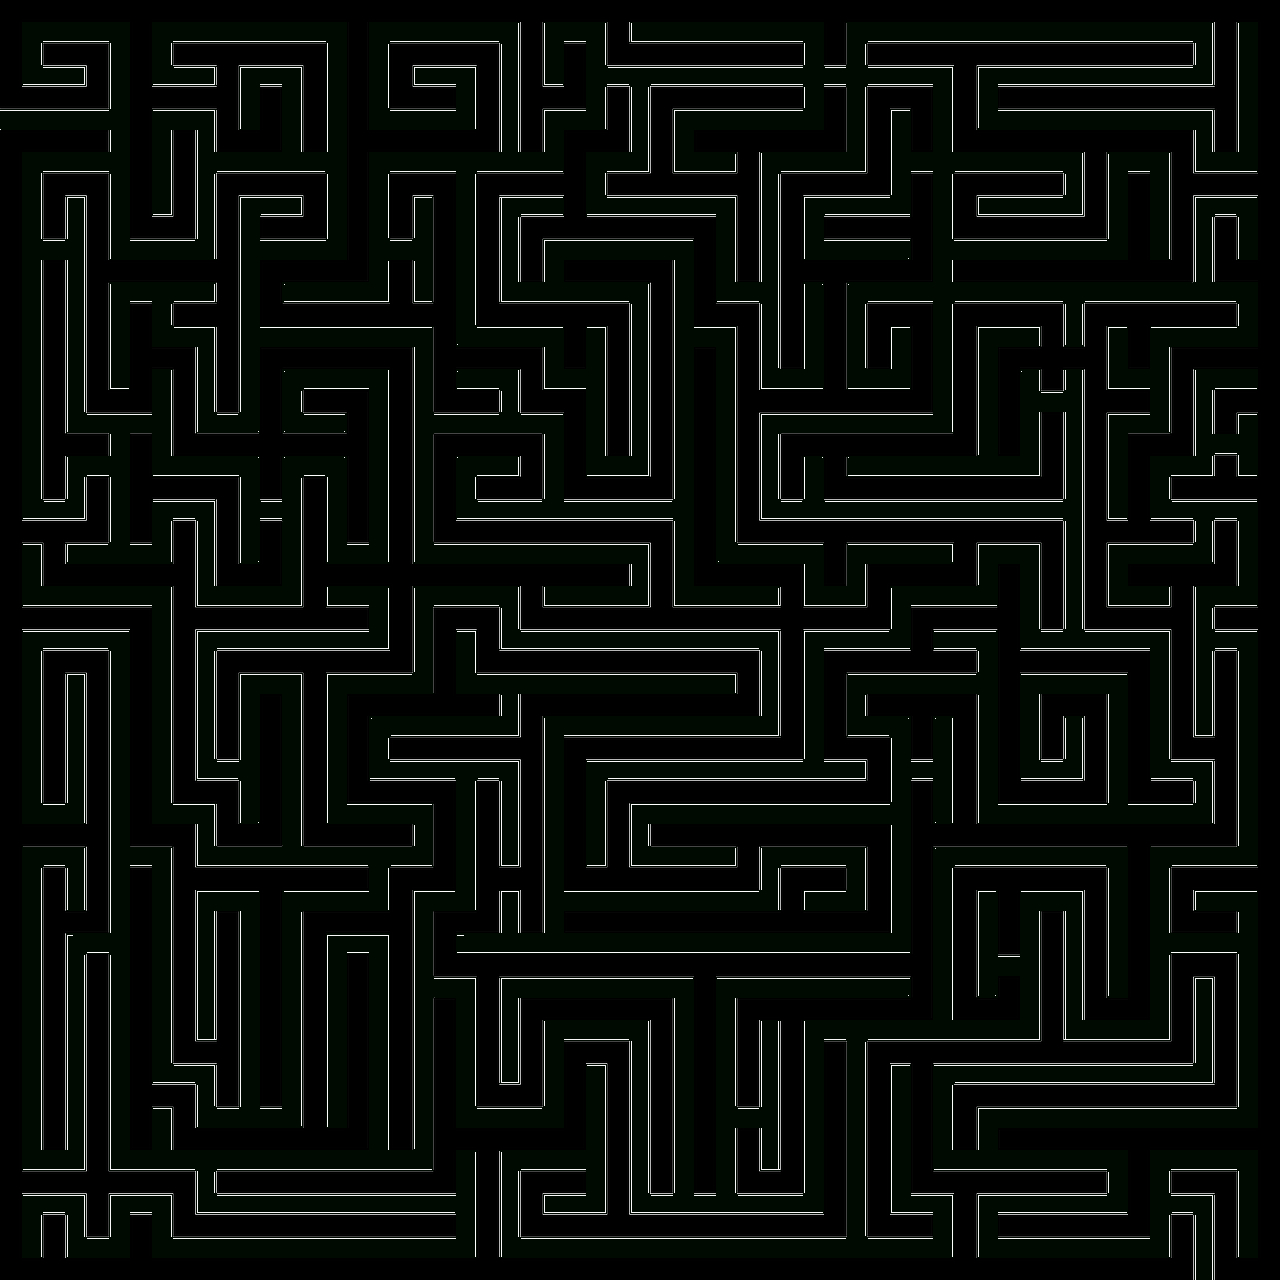 Rätselaufgaben: Labyrinth Lösen › Jugendleiter-Blog bestimmt für Rätselaufgaben